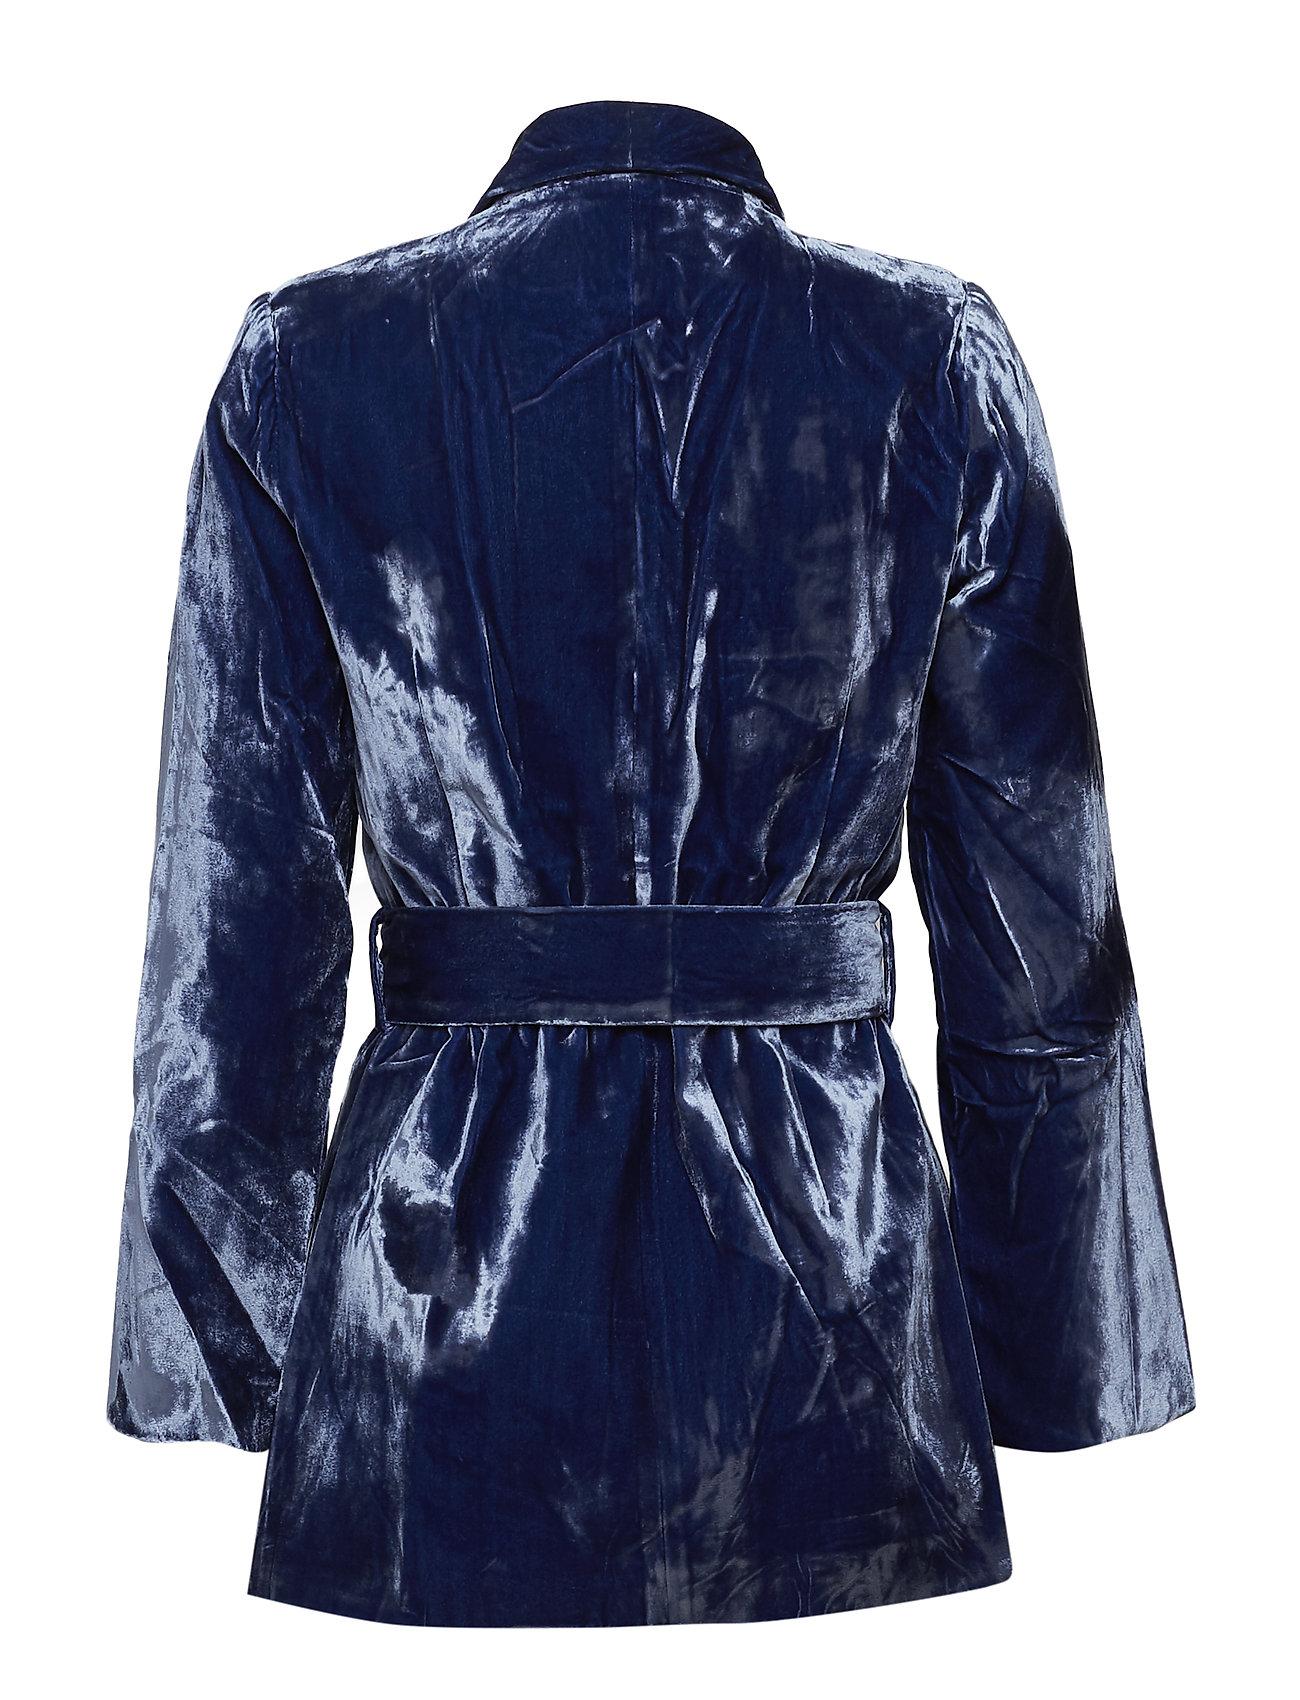 BlueBy Blazerdove Shirly BlueBy Shirly Blazerdove Malina R3AjL54